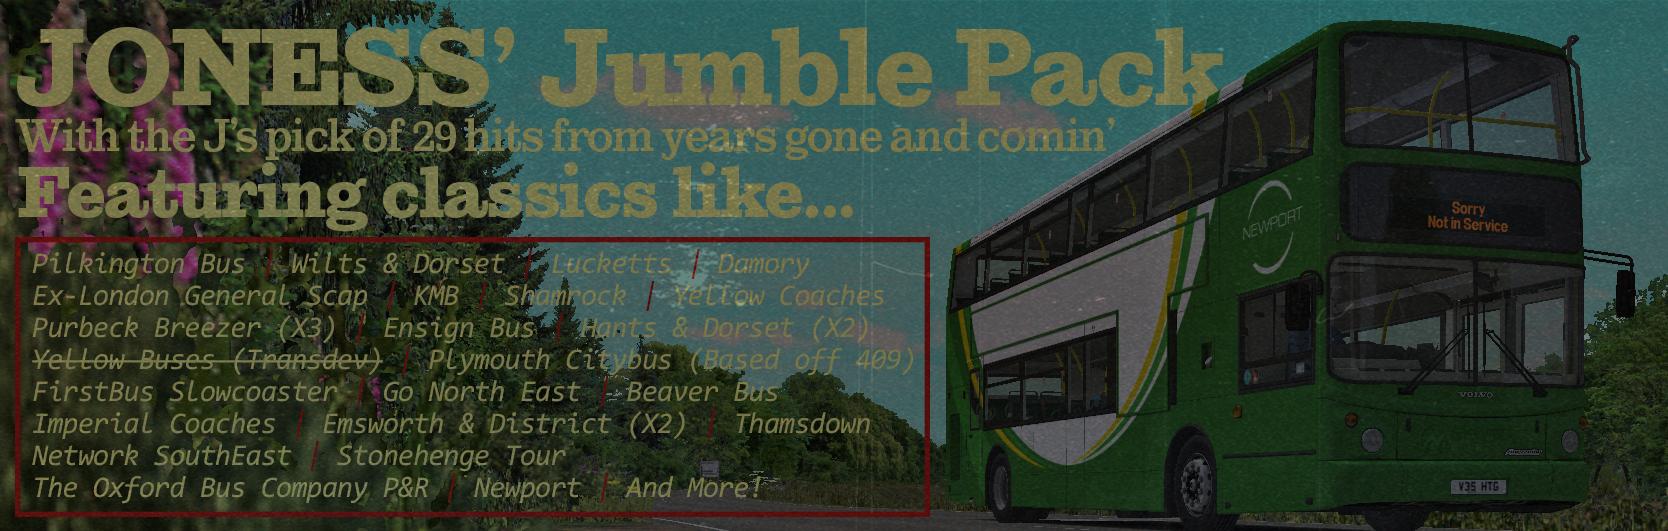 joness-jumble-pack-b7tl2-png.4099